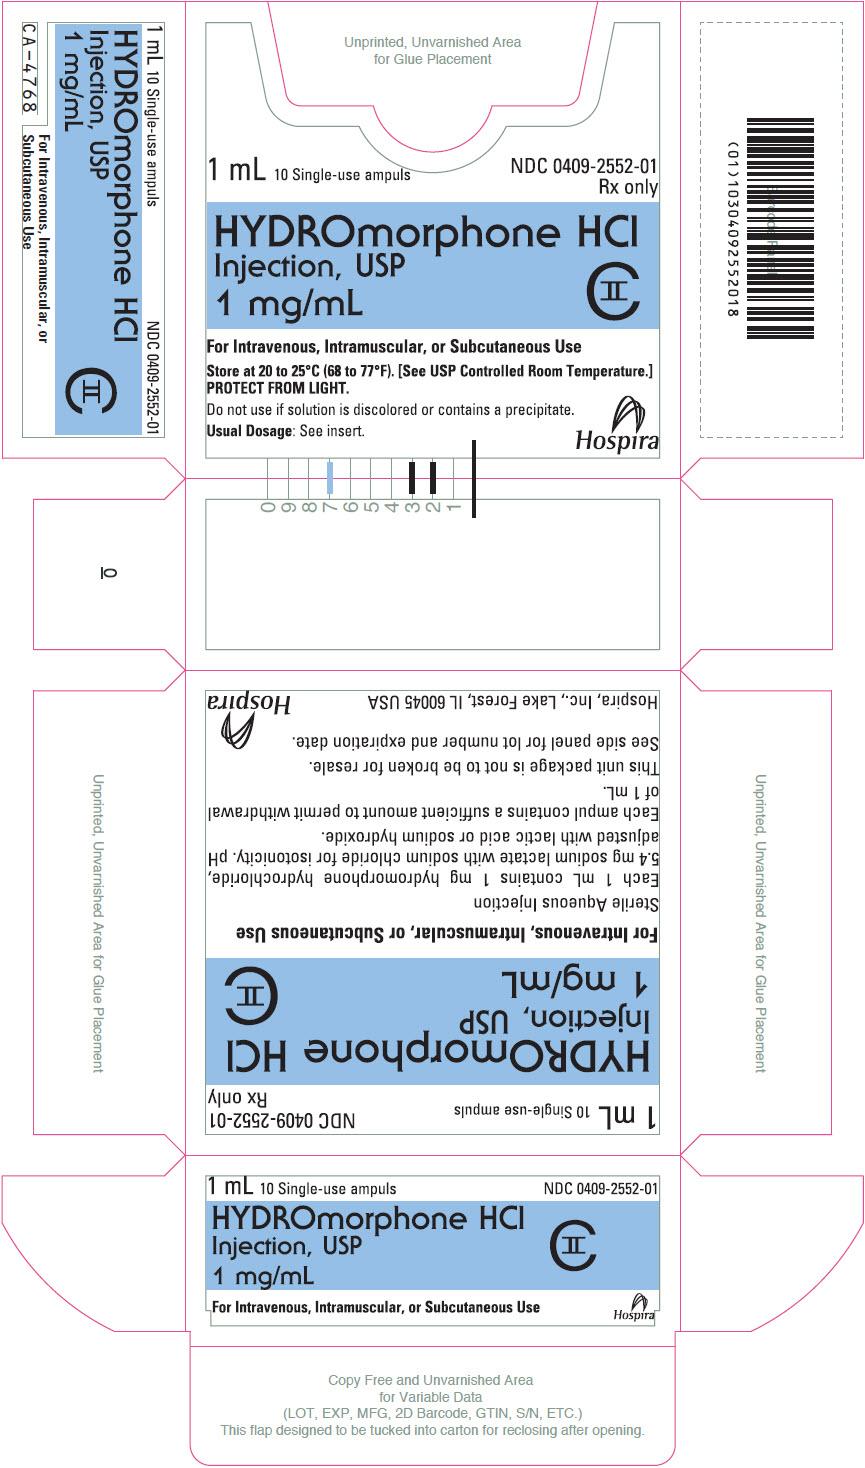 PRINCIPAL DISPLAY PANEL - 1 mg/mL Ampule Box